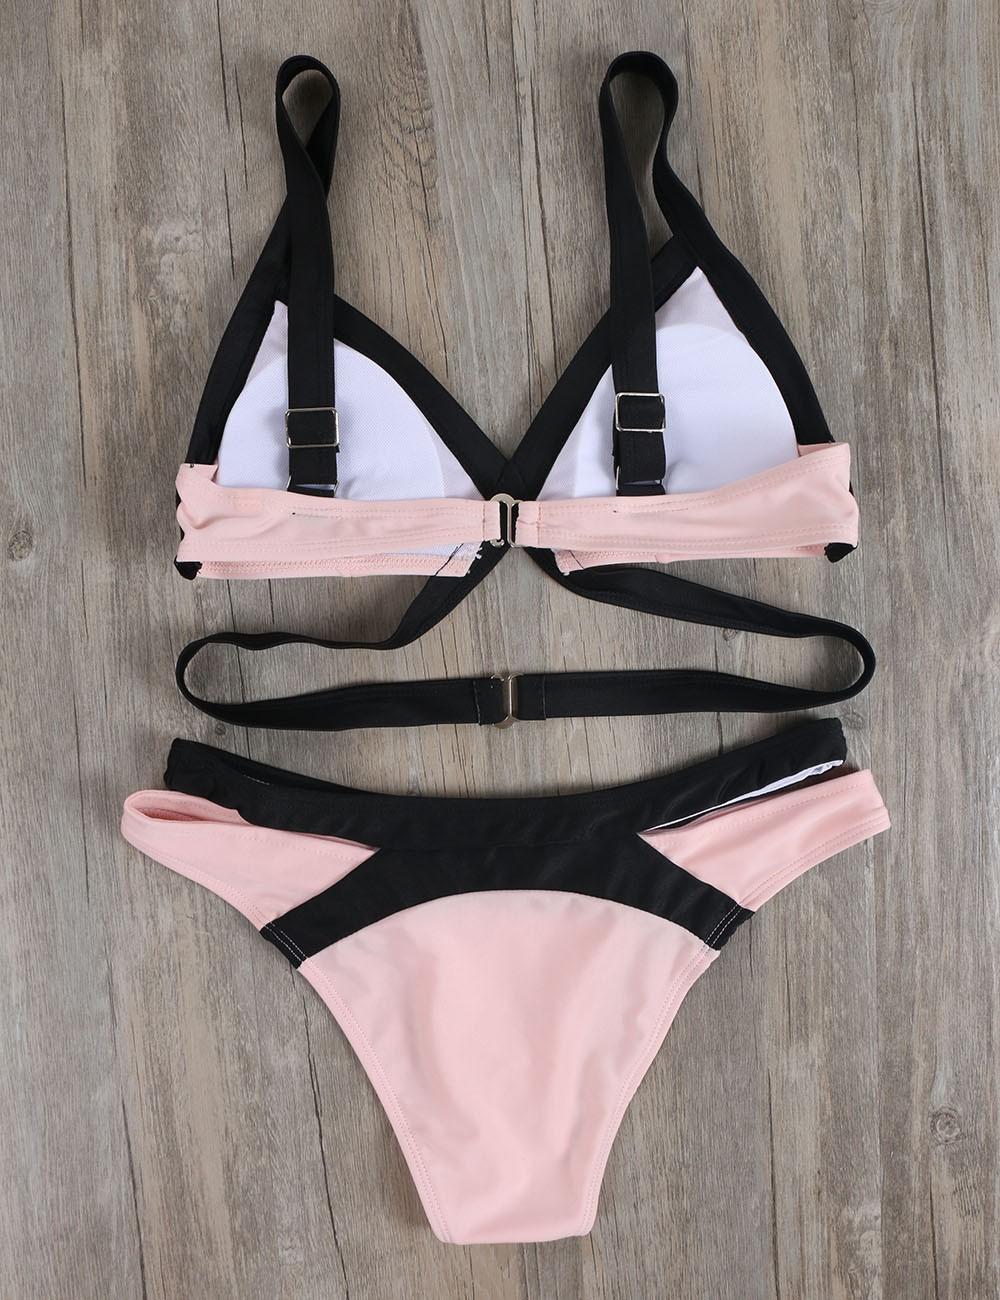 Summer Pink Plus Size Bikini Set Swimwear Women Push Up Bikinis 18 Bathing Suit Sexy Cut Out Beach Wear Cross Swimsuit Biquin 5